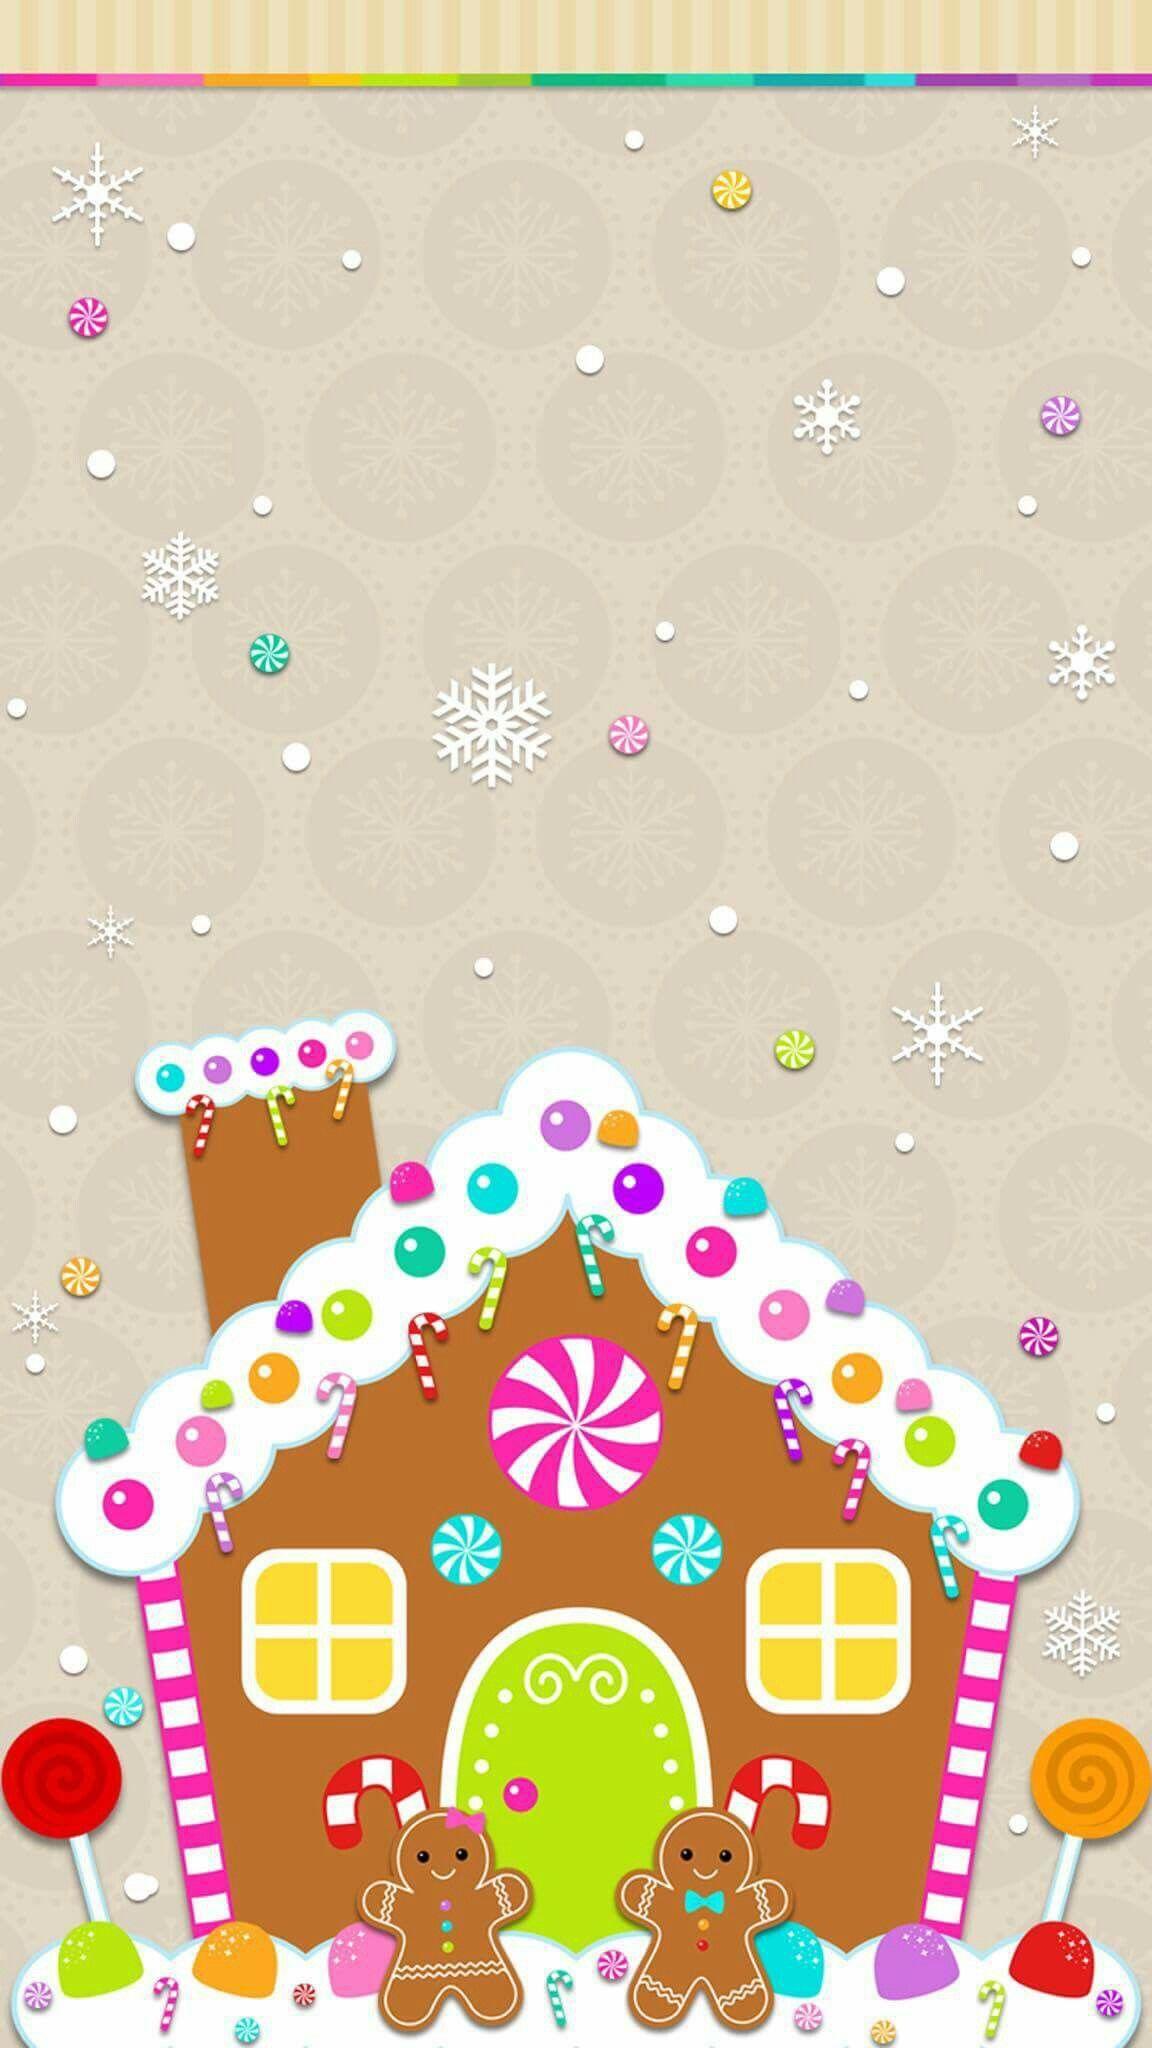 Kawaii Christmas Iphone Wallpaper | Reviewwalls.co